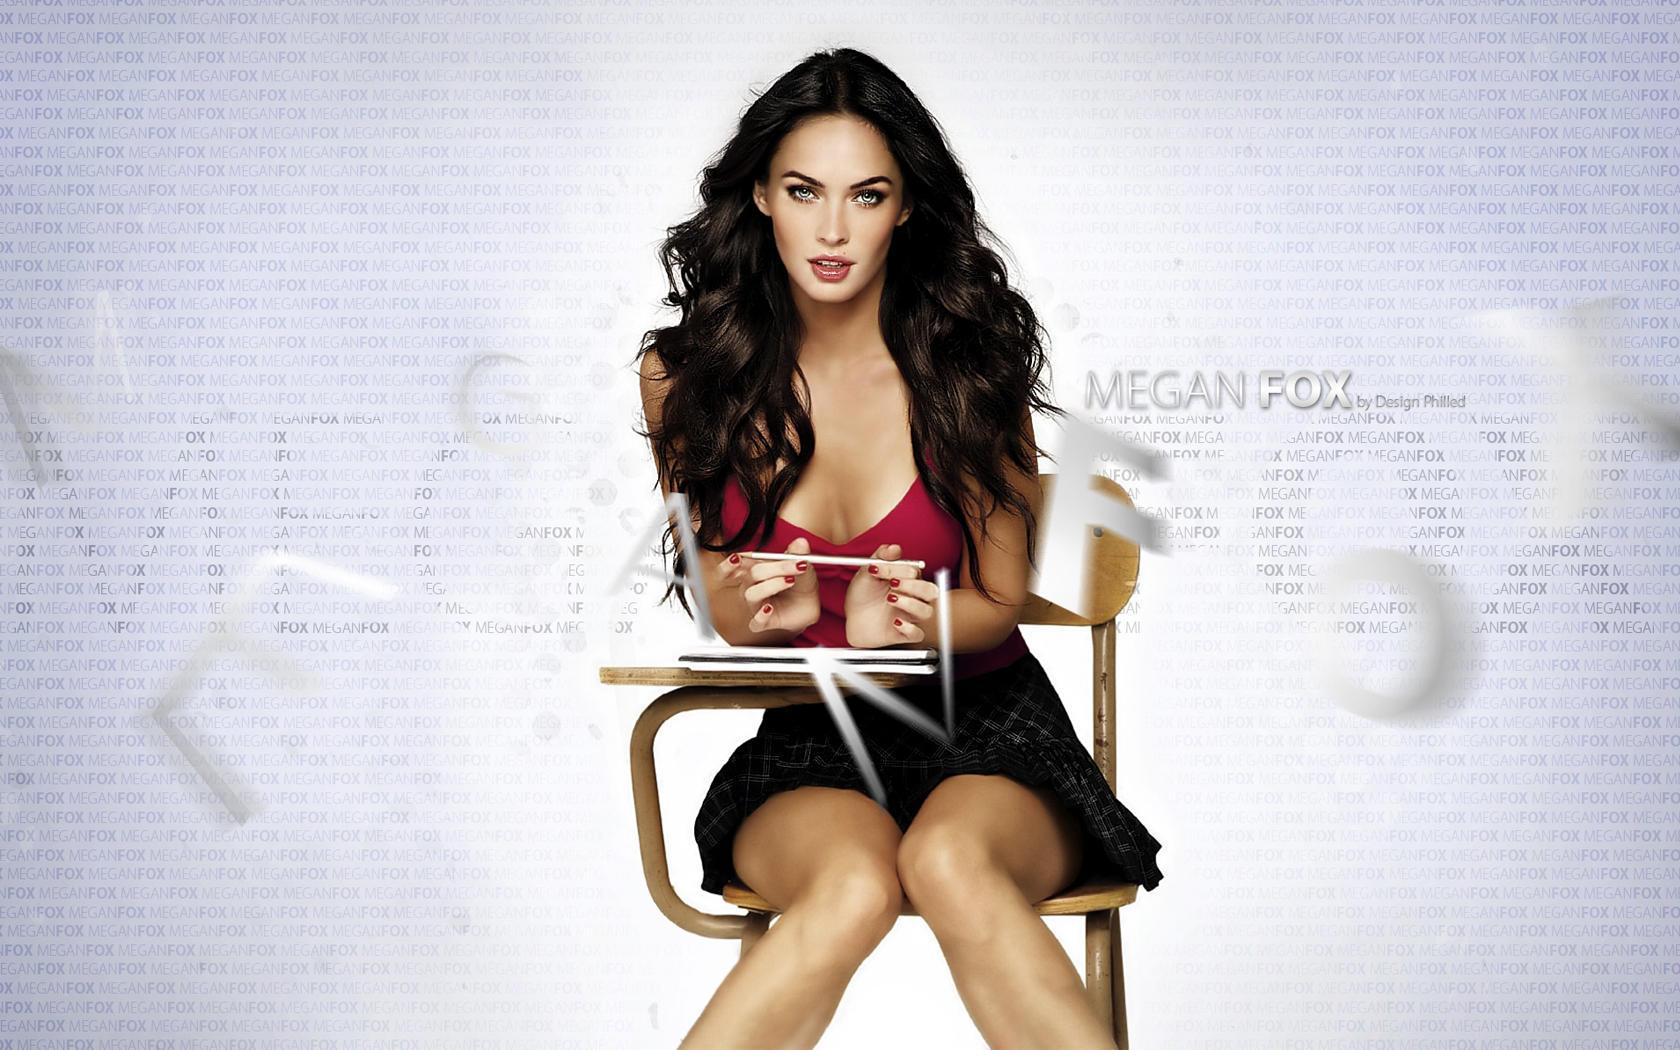 Megan Fox: Typography Desktop by DesignPhilled